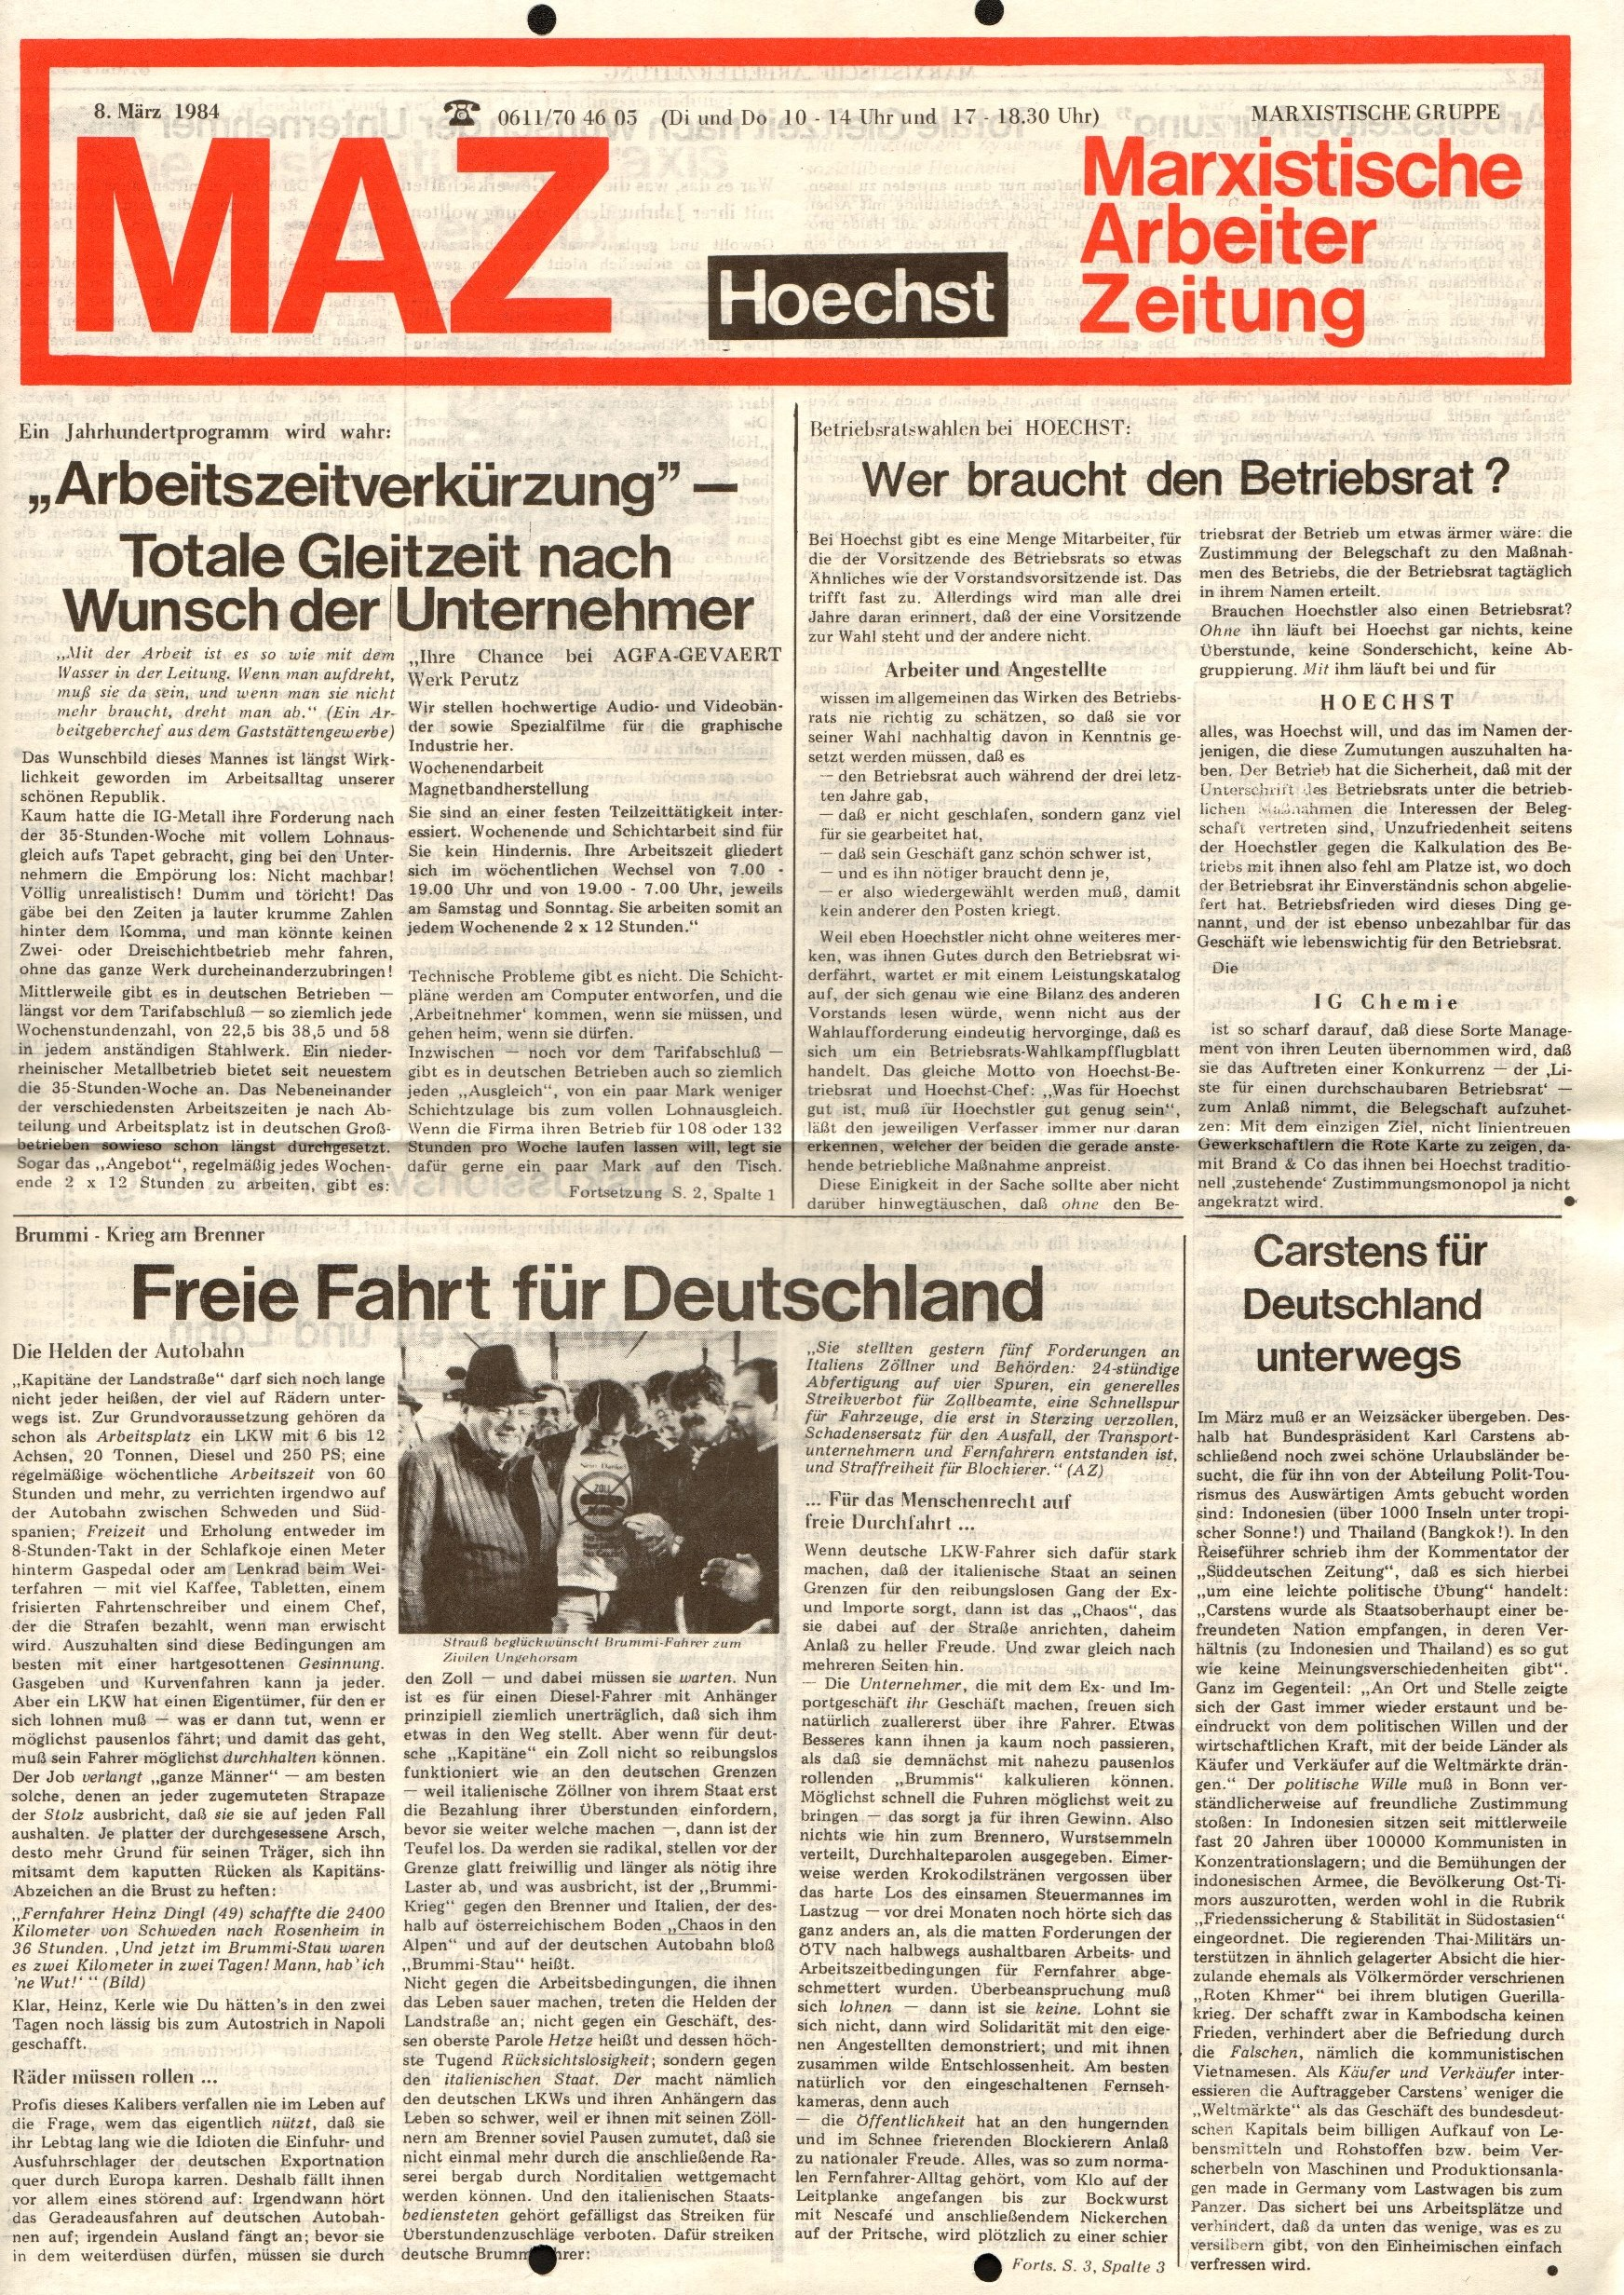 Frankfurt_CPK_Hoechst_MAZ225